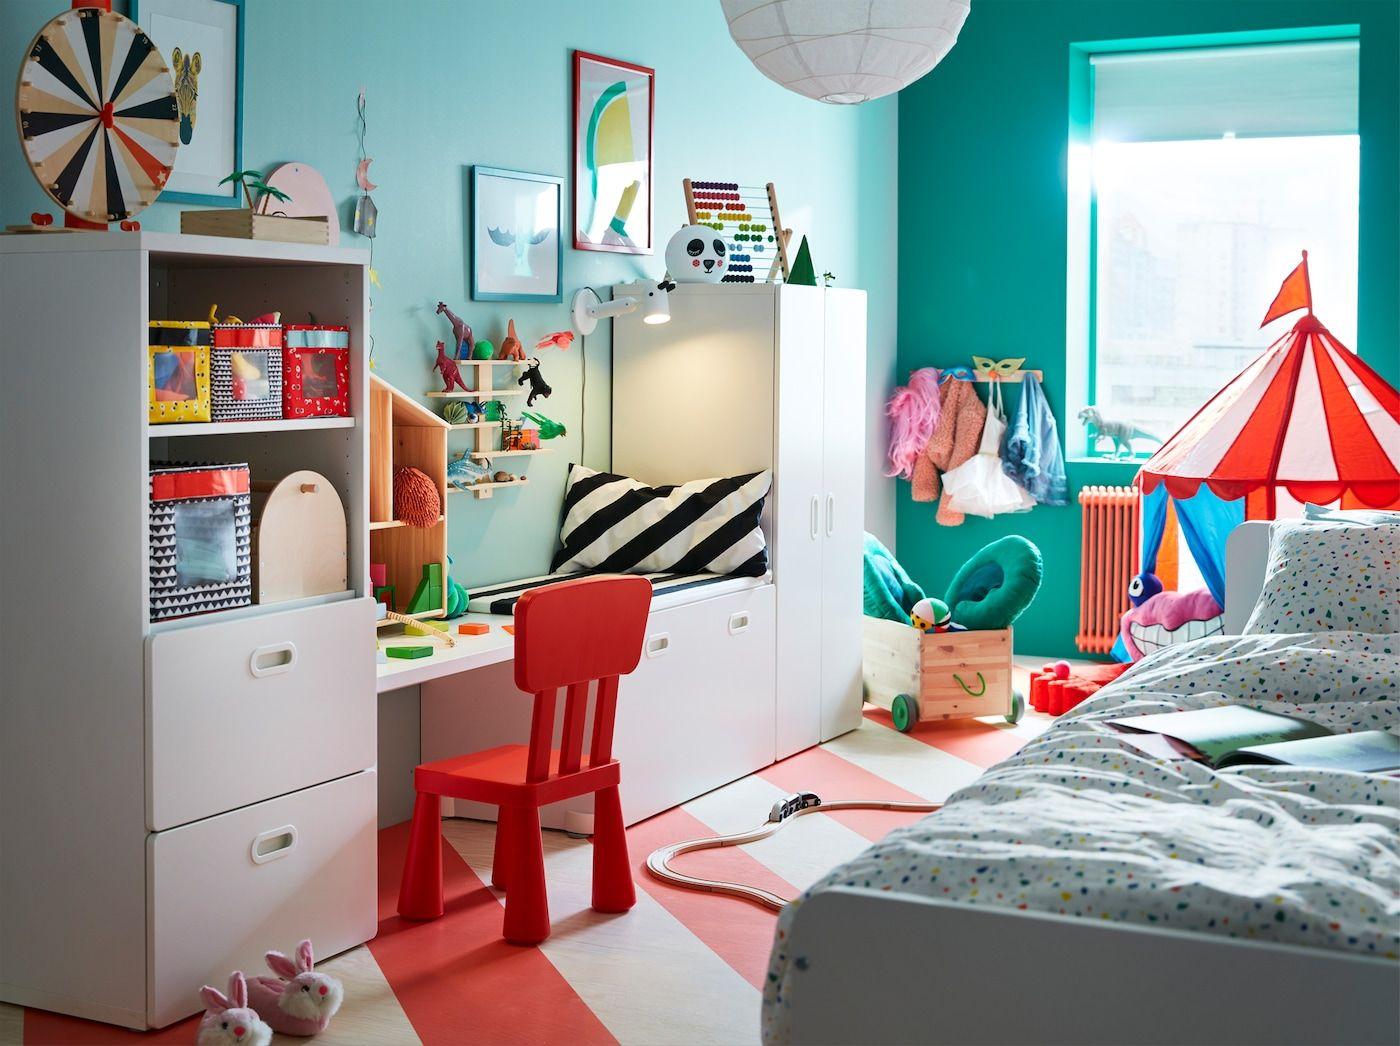 Espace De Jeu Pour Deux Enfants Ikea Kinderkamer Ikea Slaapkamer Kind Slaapkamers Bedroom furniture kids bedroom